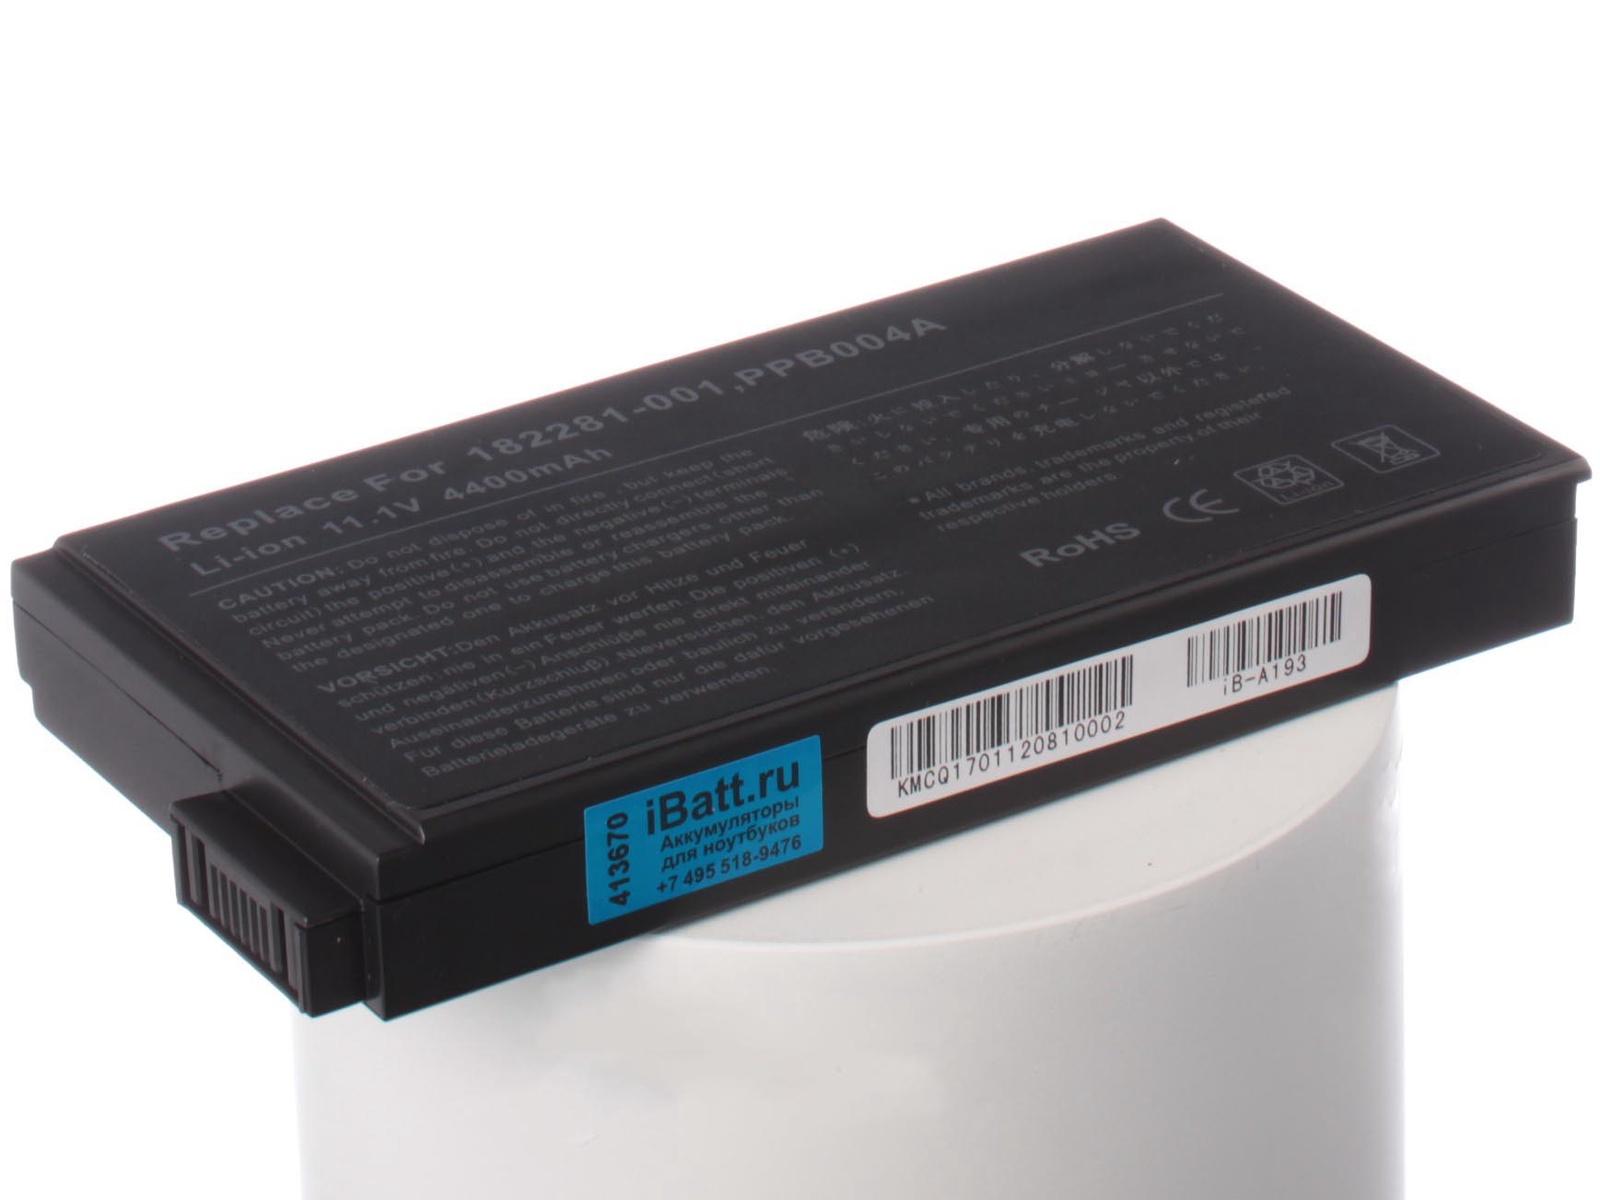 Аккумулятор для ноутбука iBatt для HP-Compaq nc6000, nx5000, nc8000, Evo N800v, Evo N800c, Evo N1020v, Presario 1500, Evo N1000c, nx8000, nw8000, Evo N1015v, Presario 900, Presario 1700, Presario 2800, PP2001, PP2190 mtd sdl 2800 evo